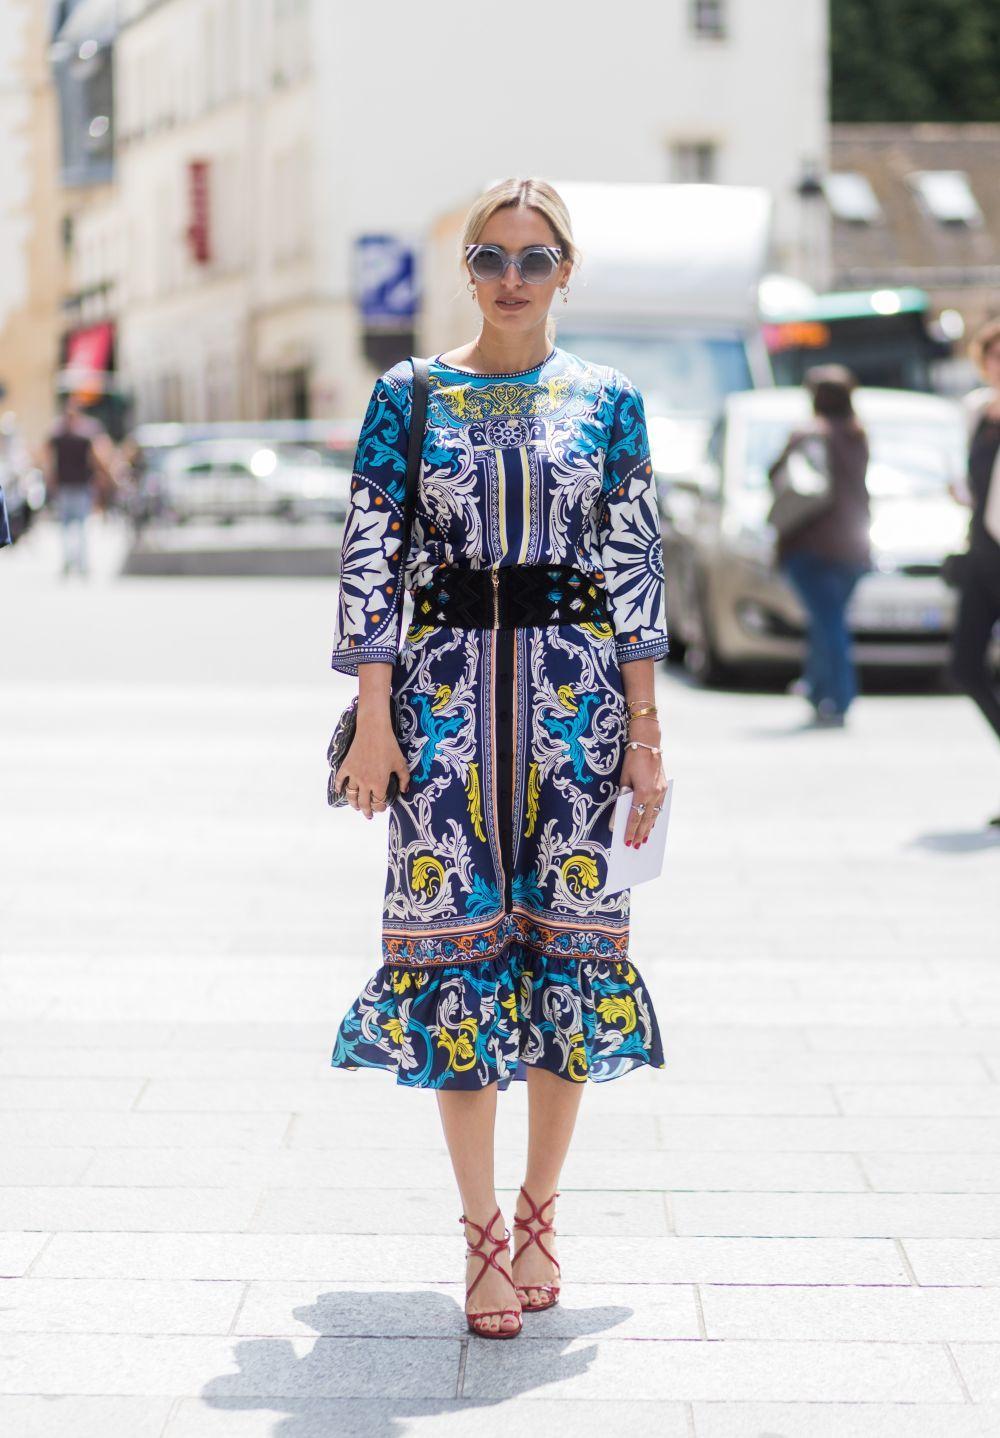 Vestido Midi Sandalias Street Style Y París Se Rinde Al